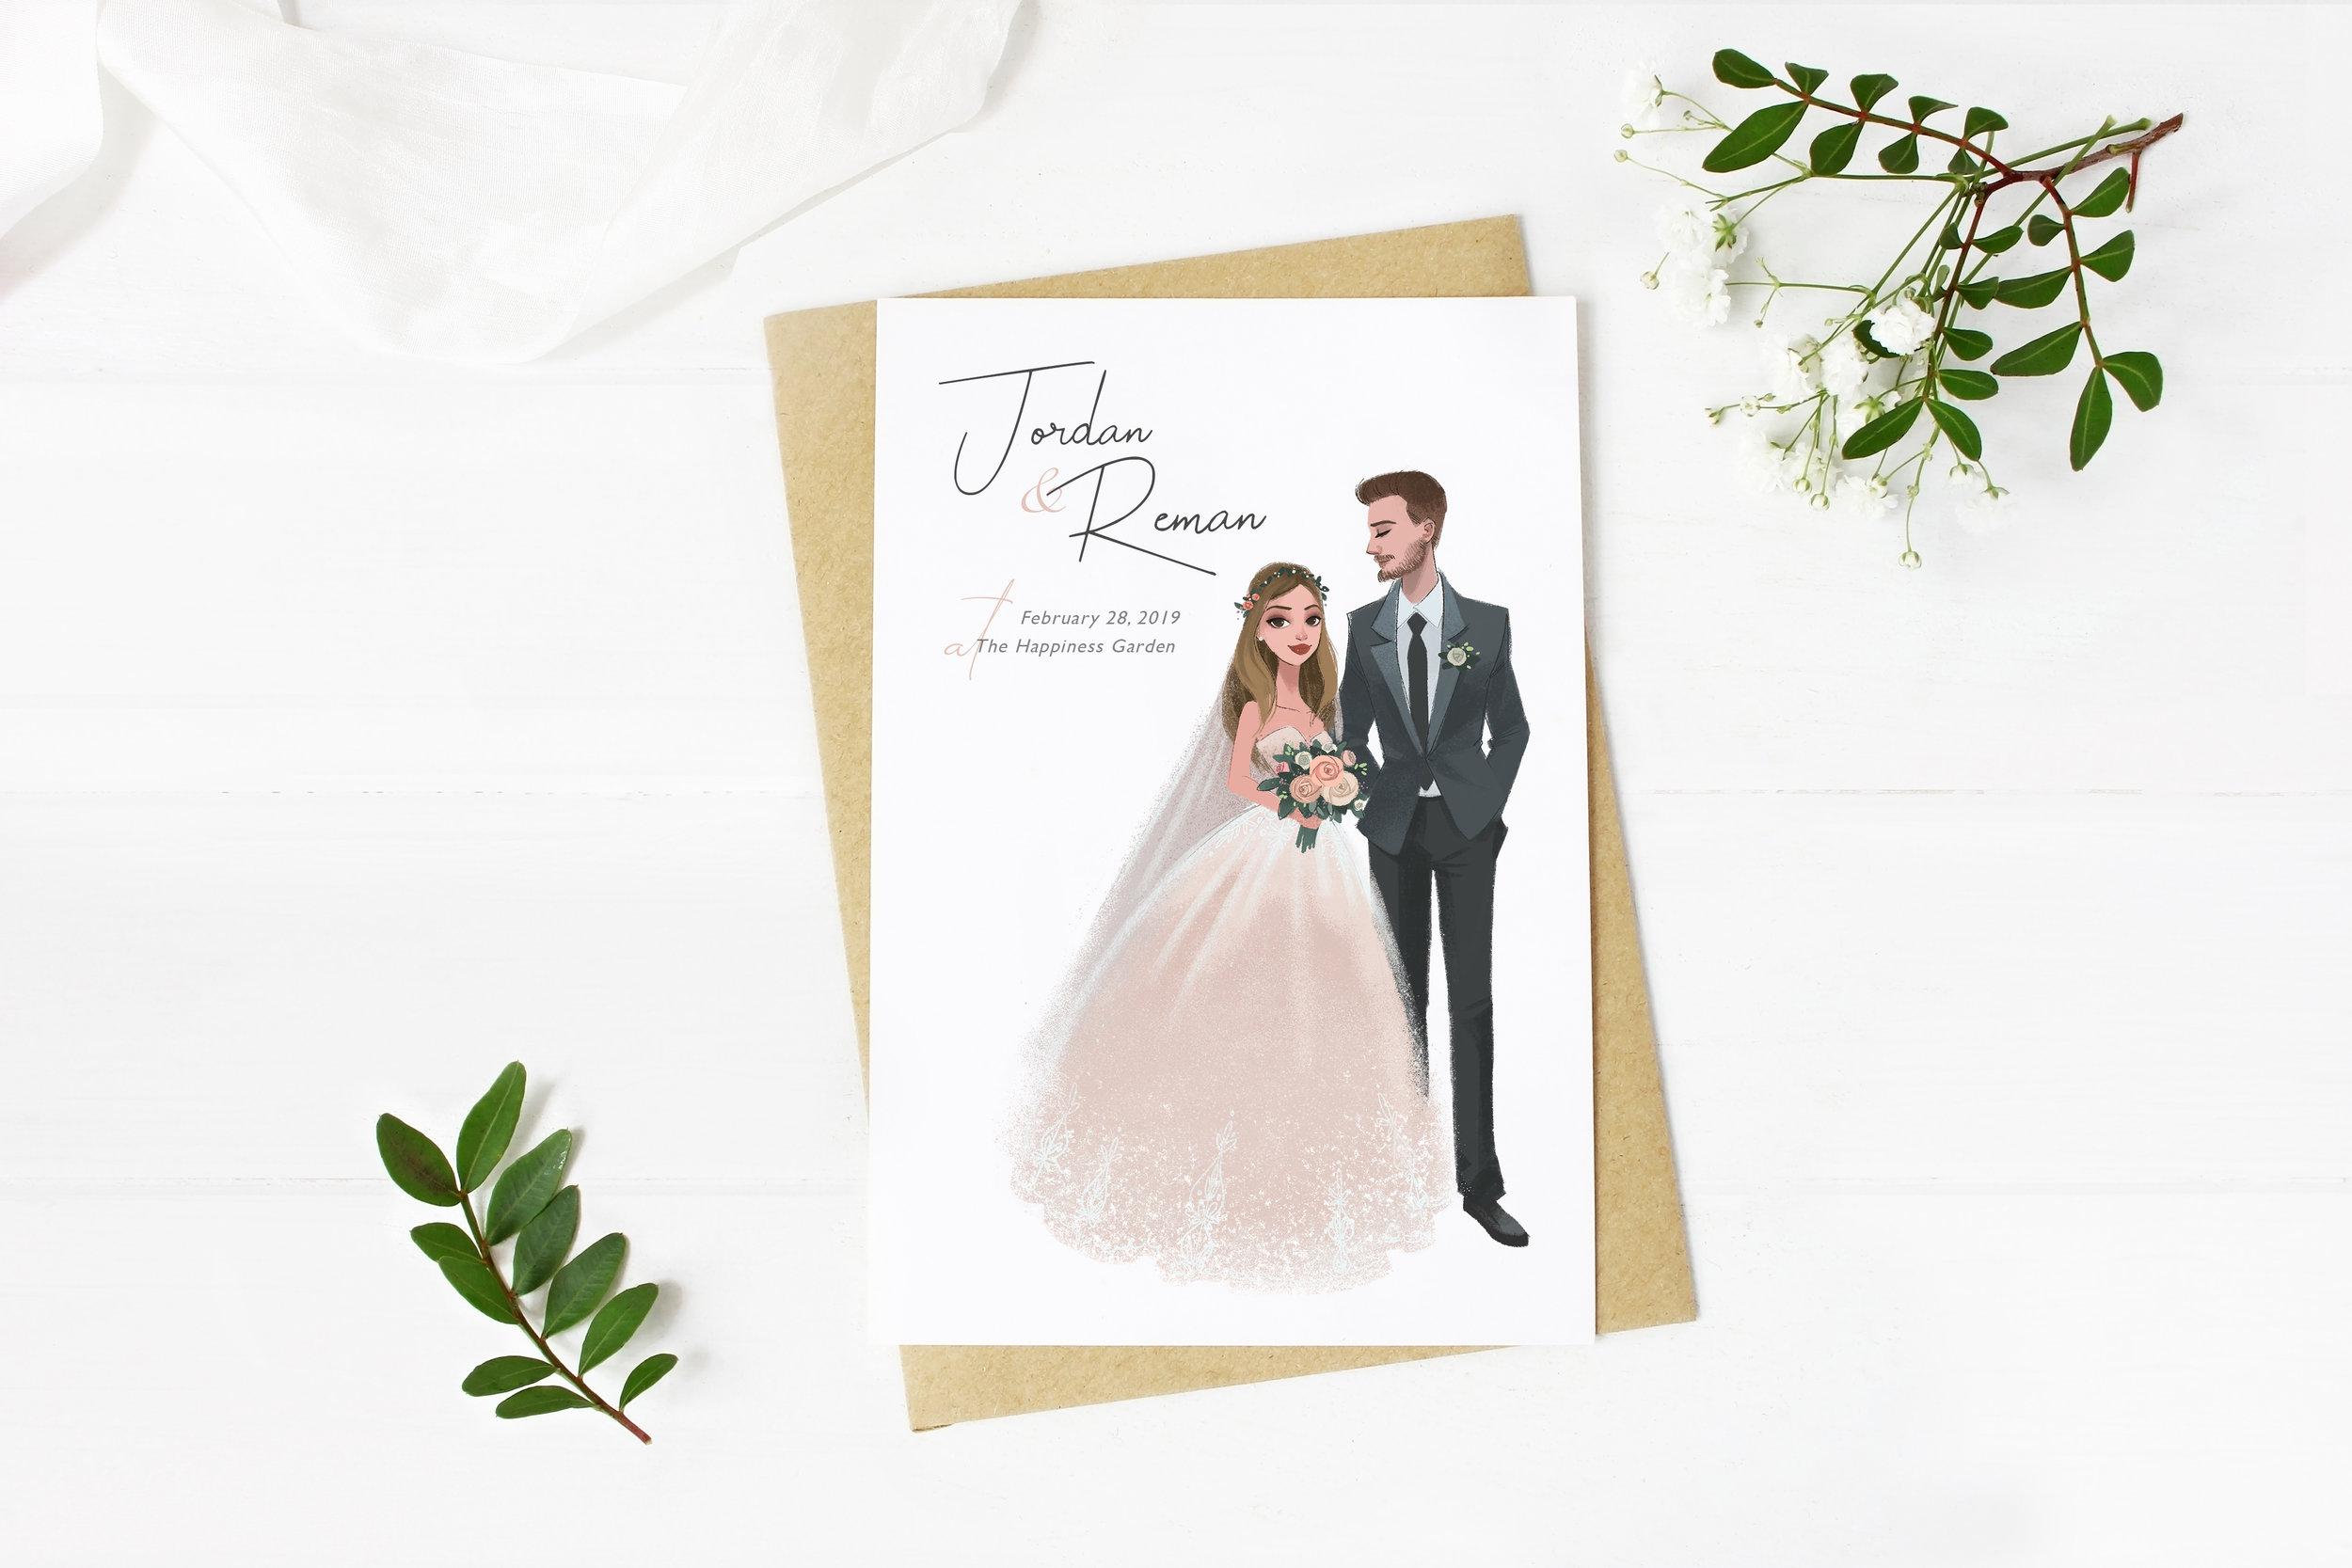 wedding invite 1216_2019.jpg